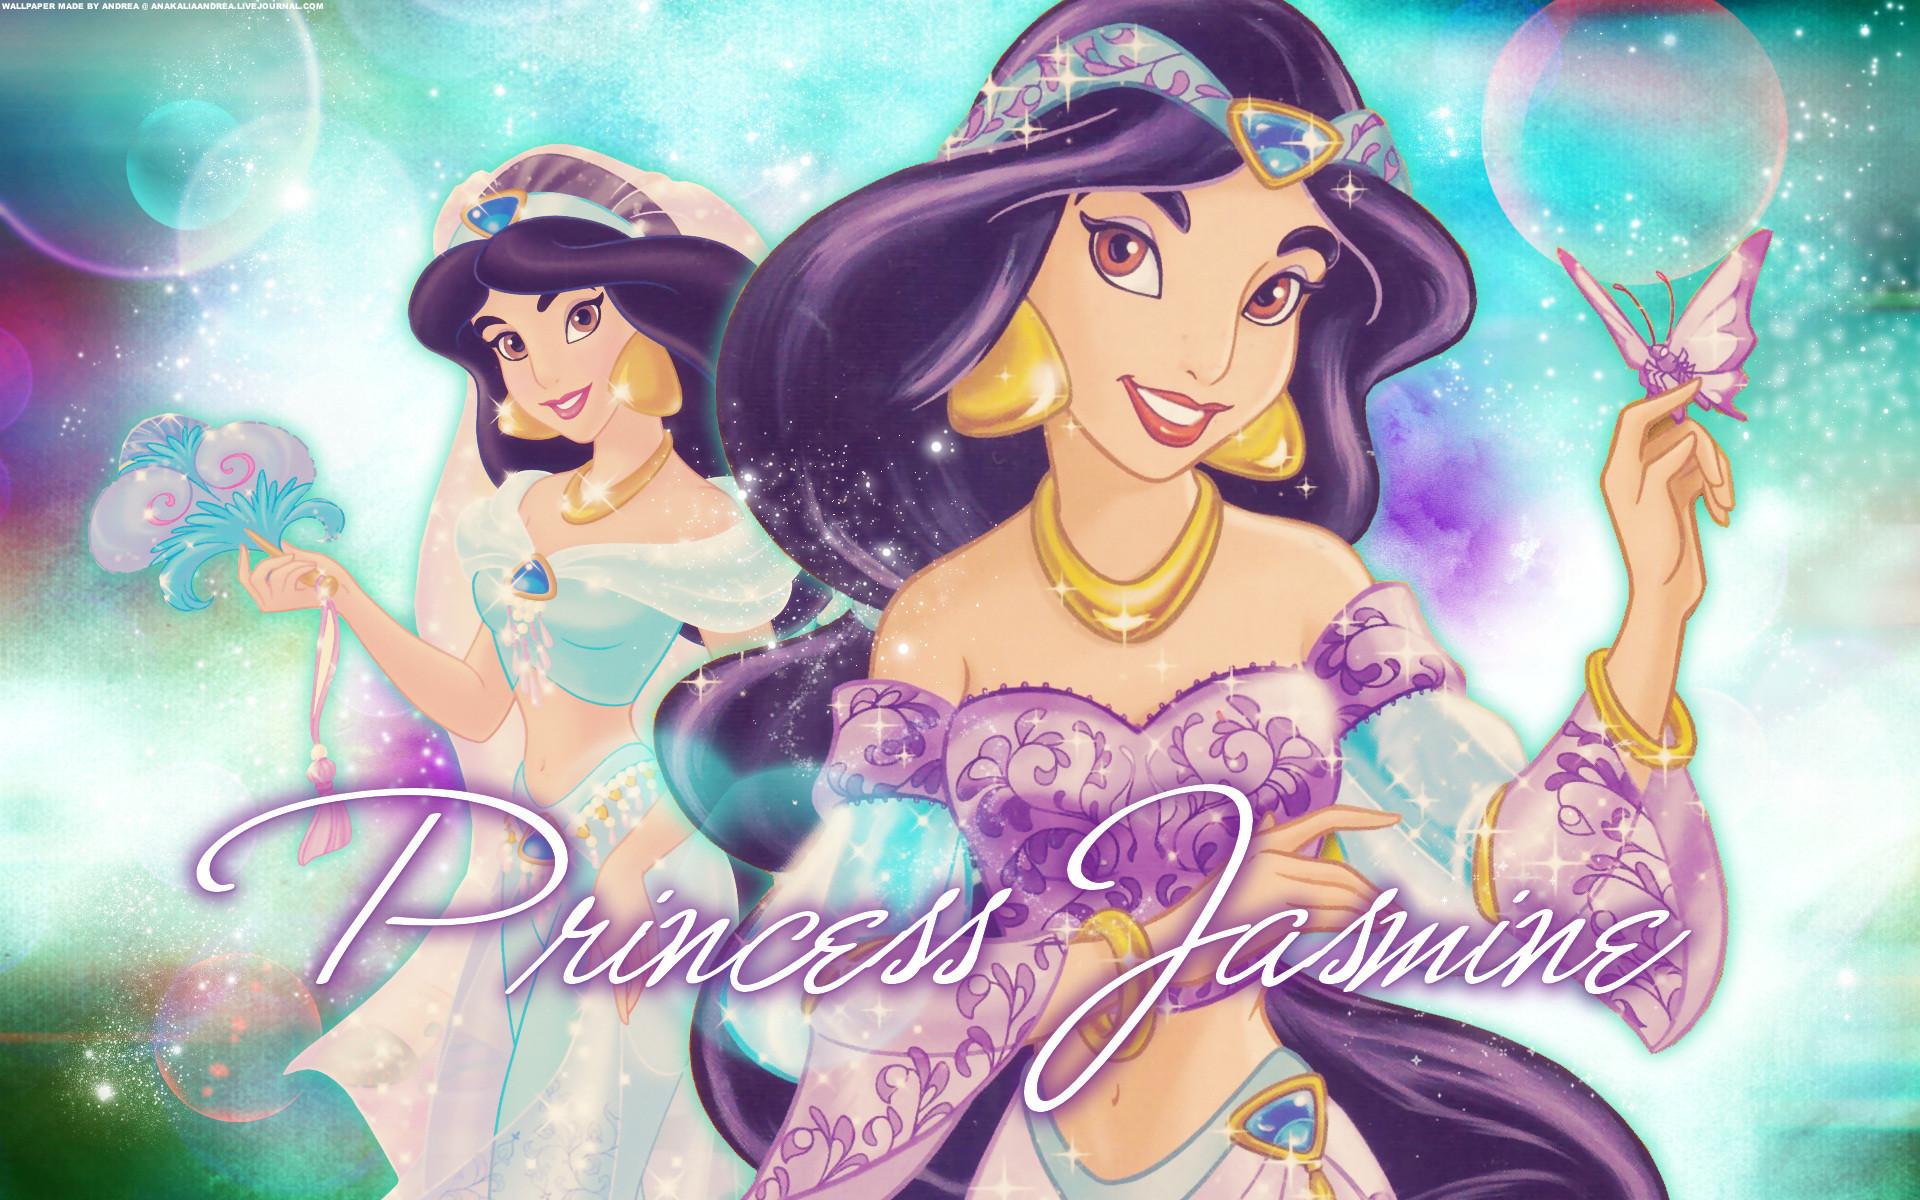 Disney Princess Wallpapers 66 Images